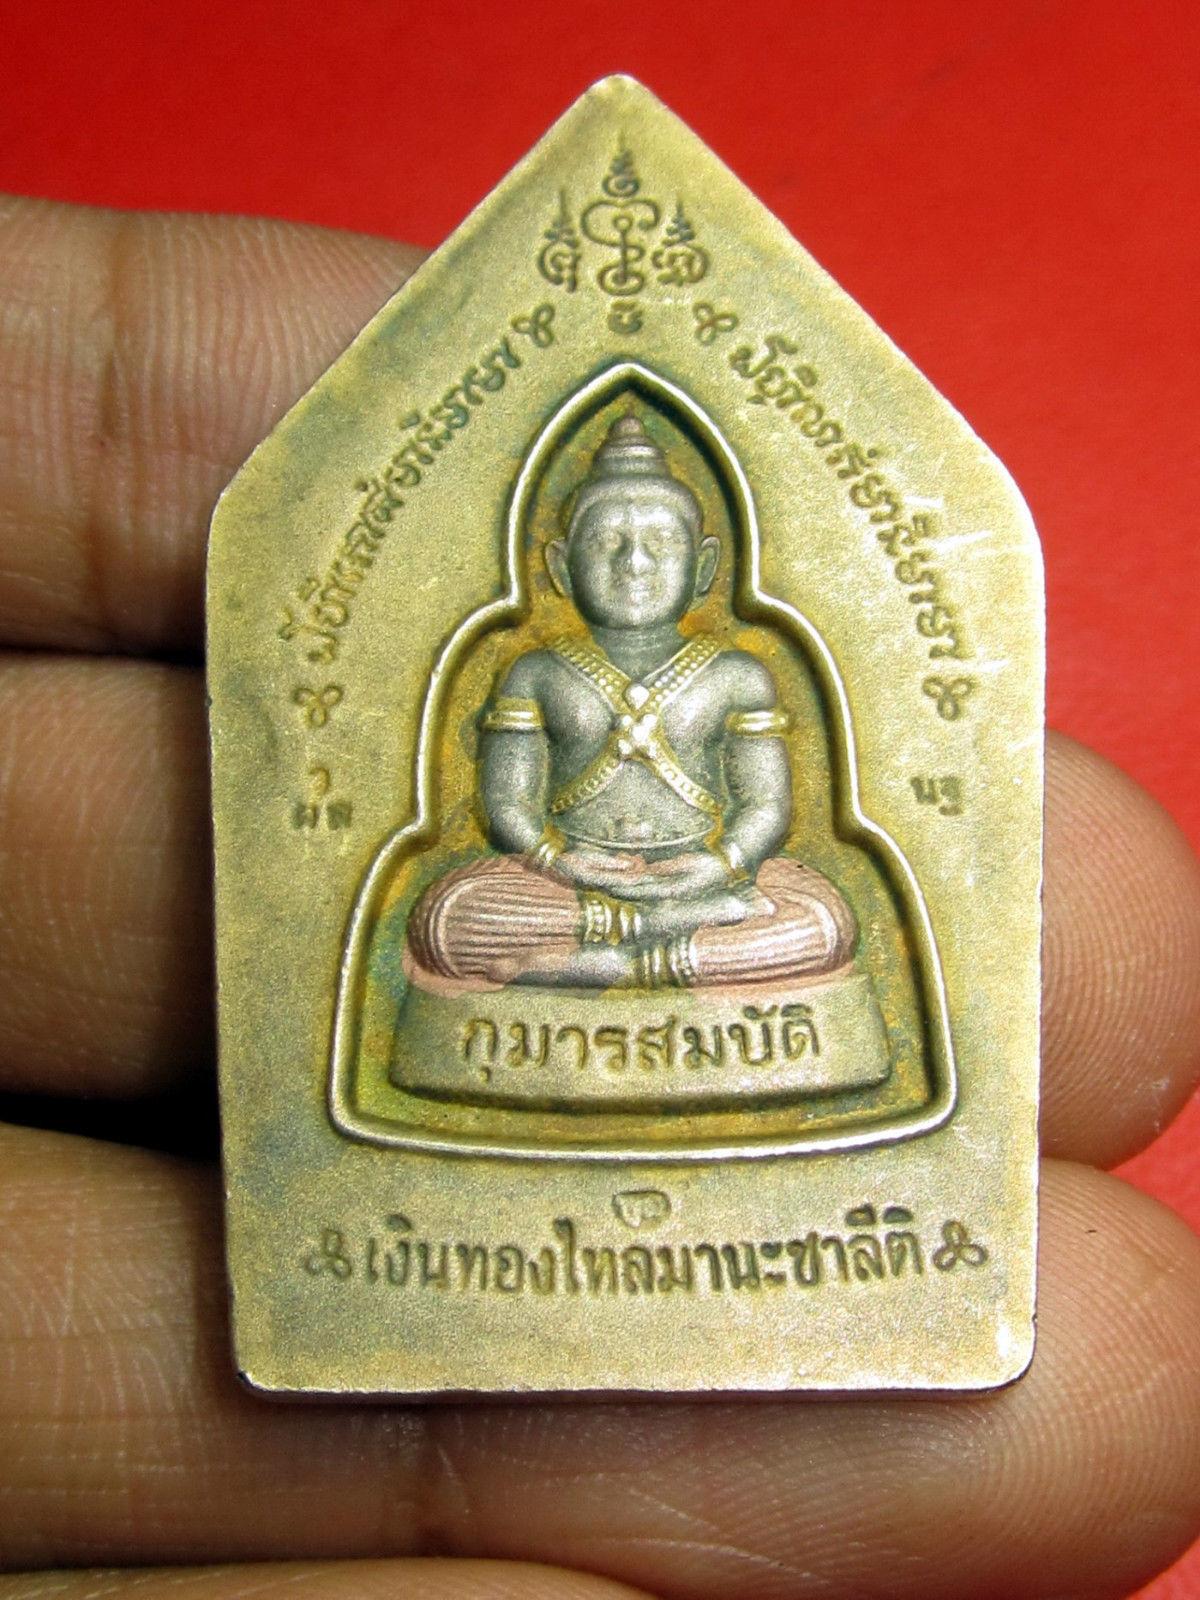 VERY RARE HOLY PHRA KHUN-PHAEN LP POON WAT PAI-LOM TOP THAI BUDDHA AMULETS